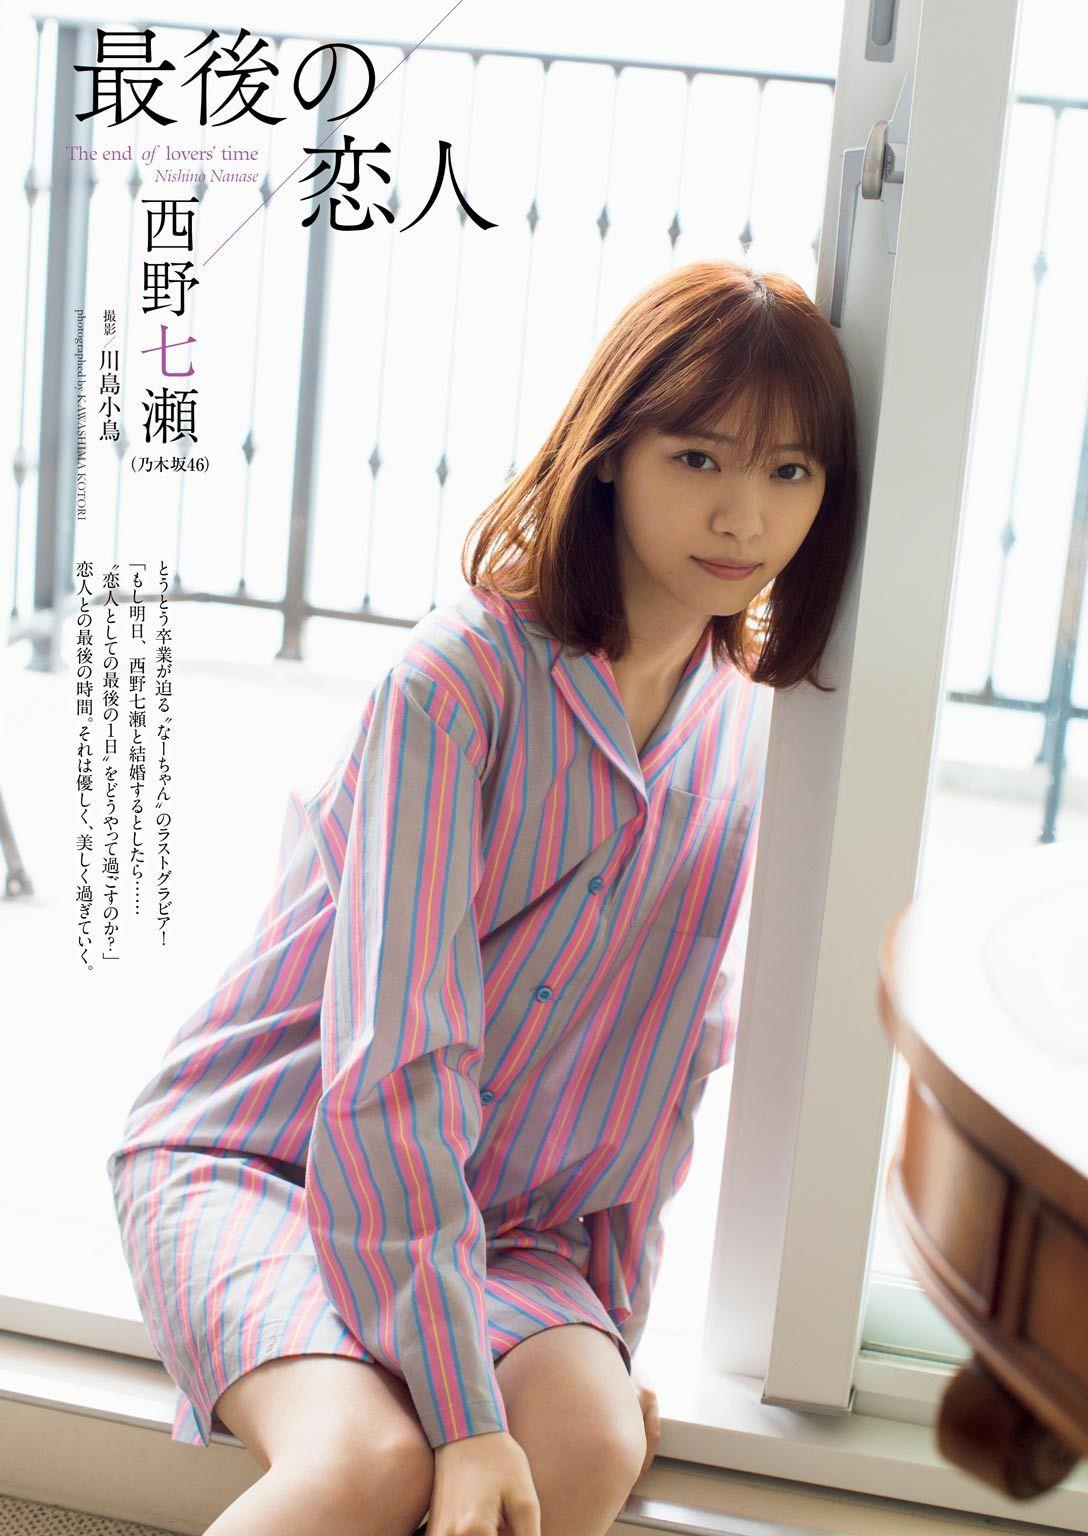 NNishino WPB 190114 02.jpg